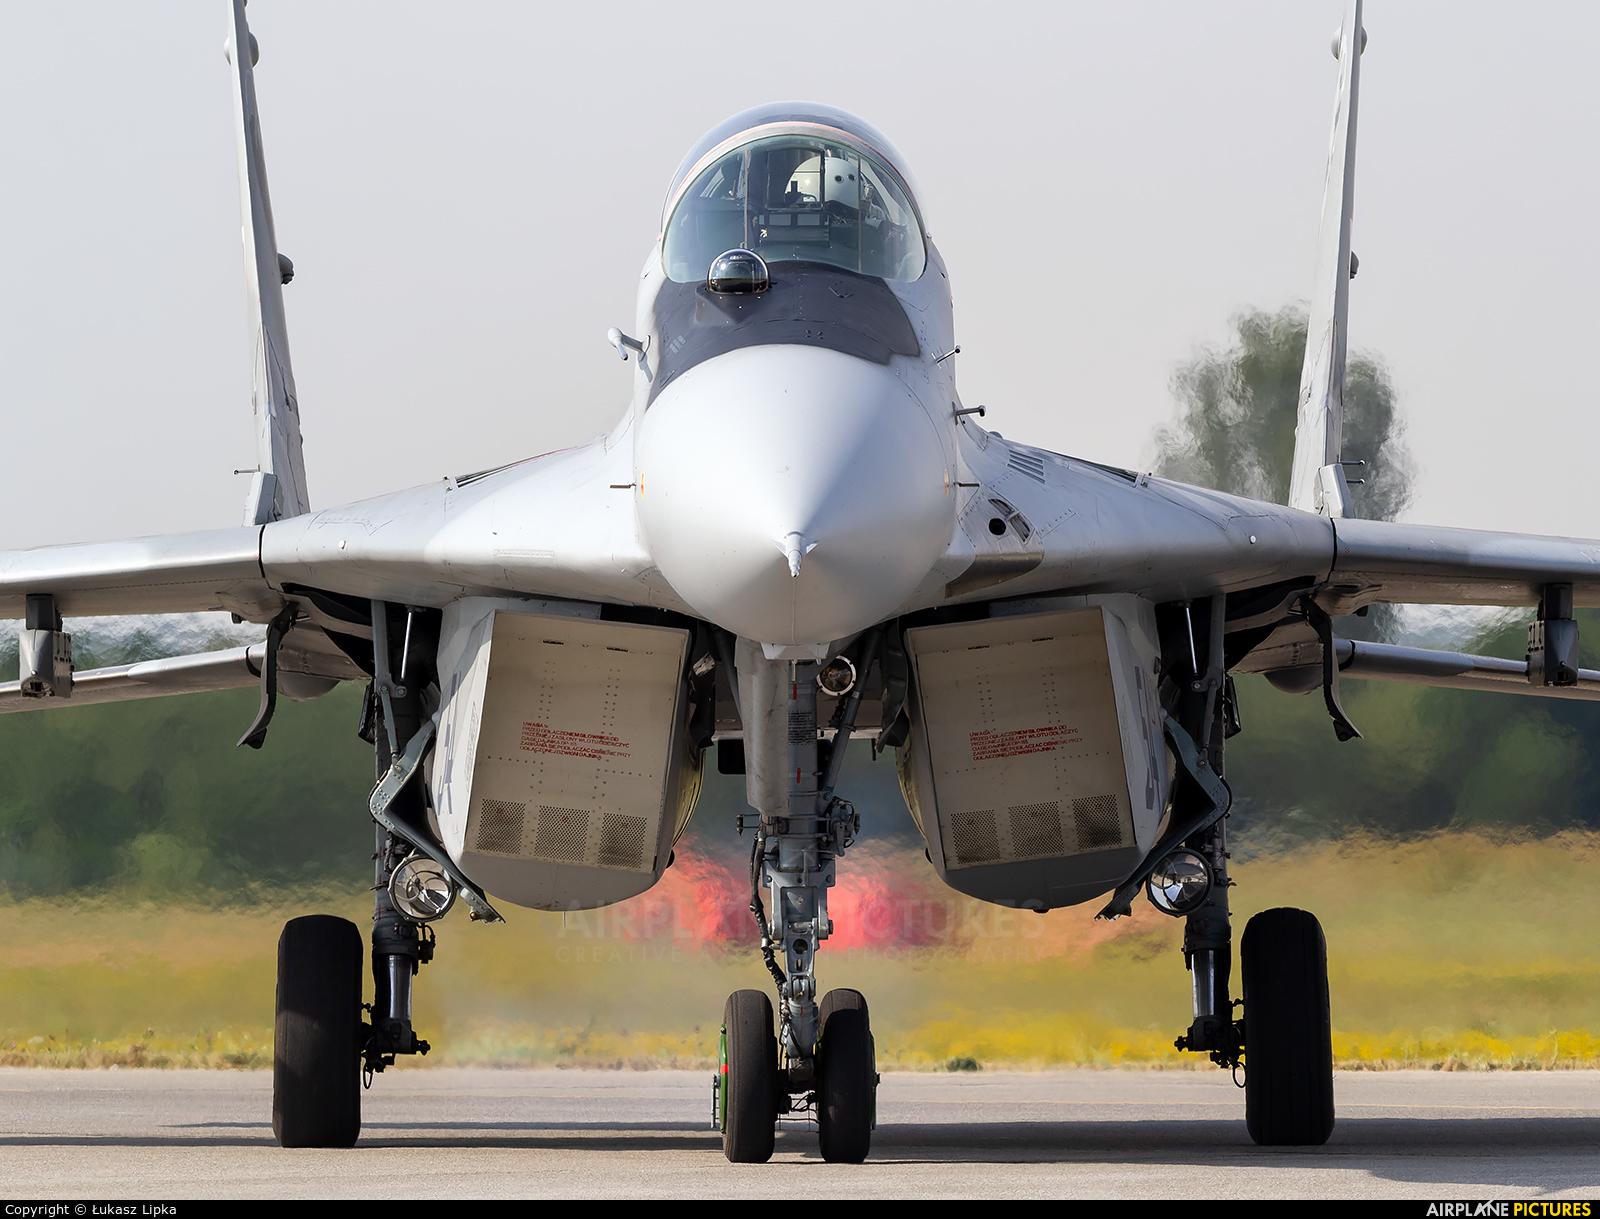 Poland - Air Force 54 aircraft at Dęblin